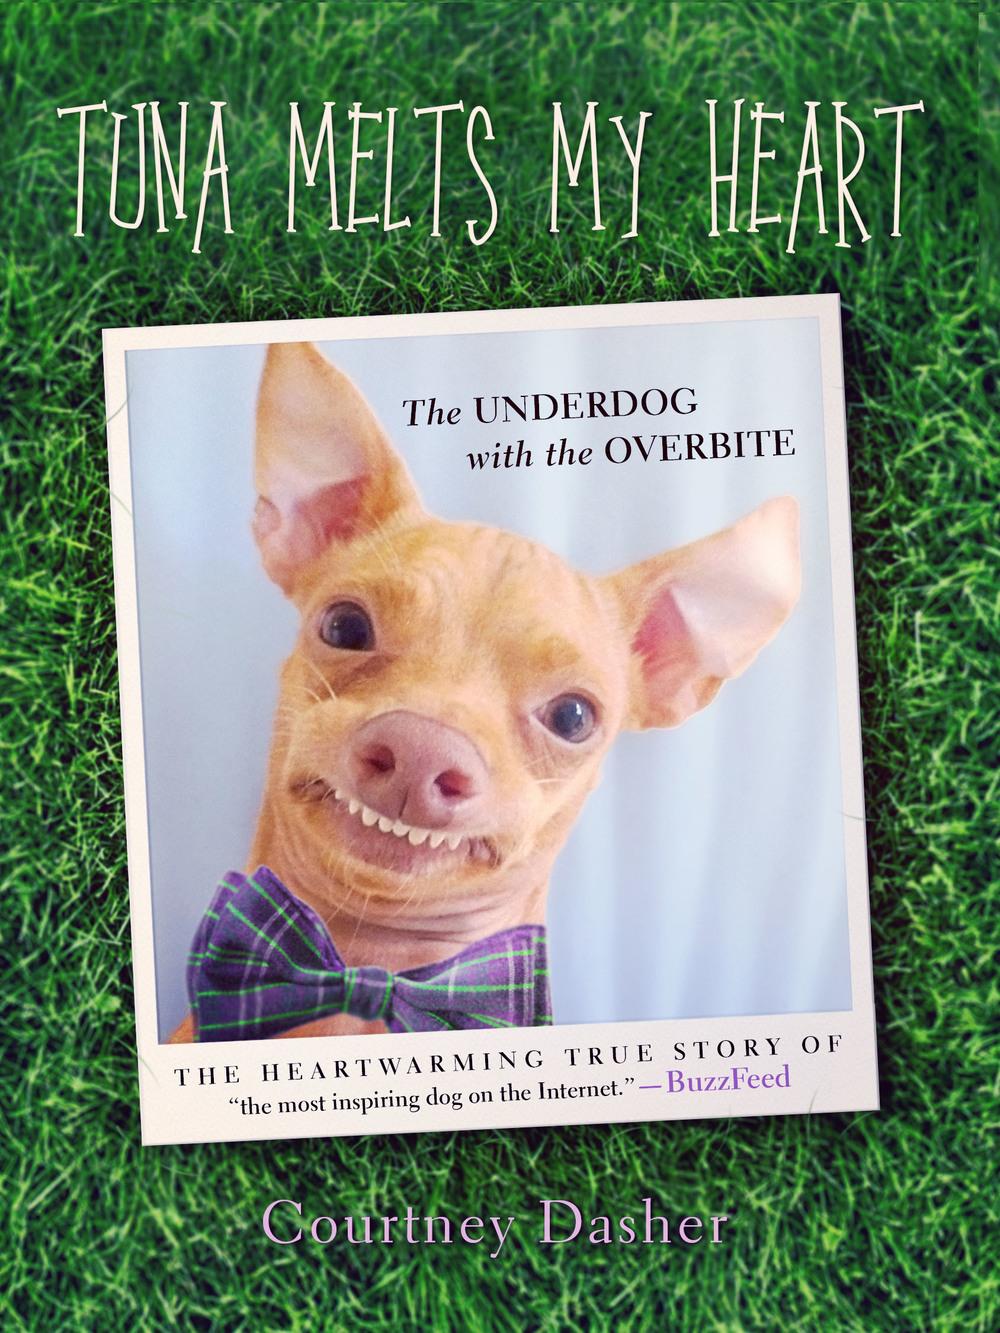 book tunameltsmyheart